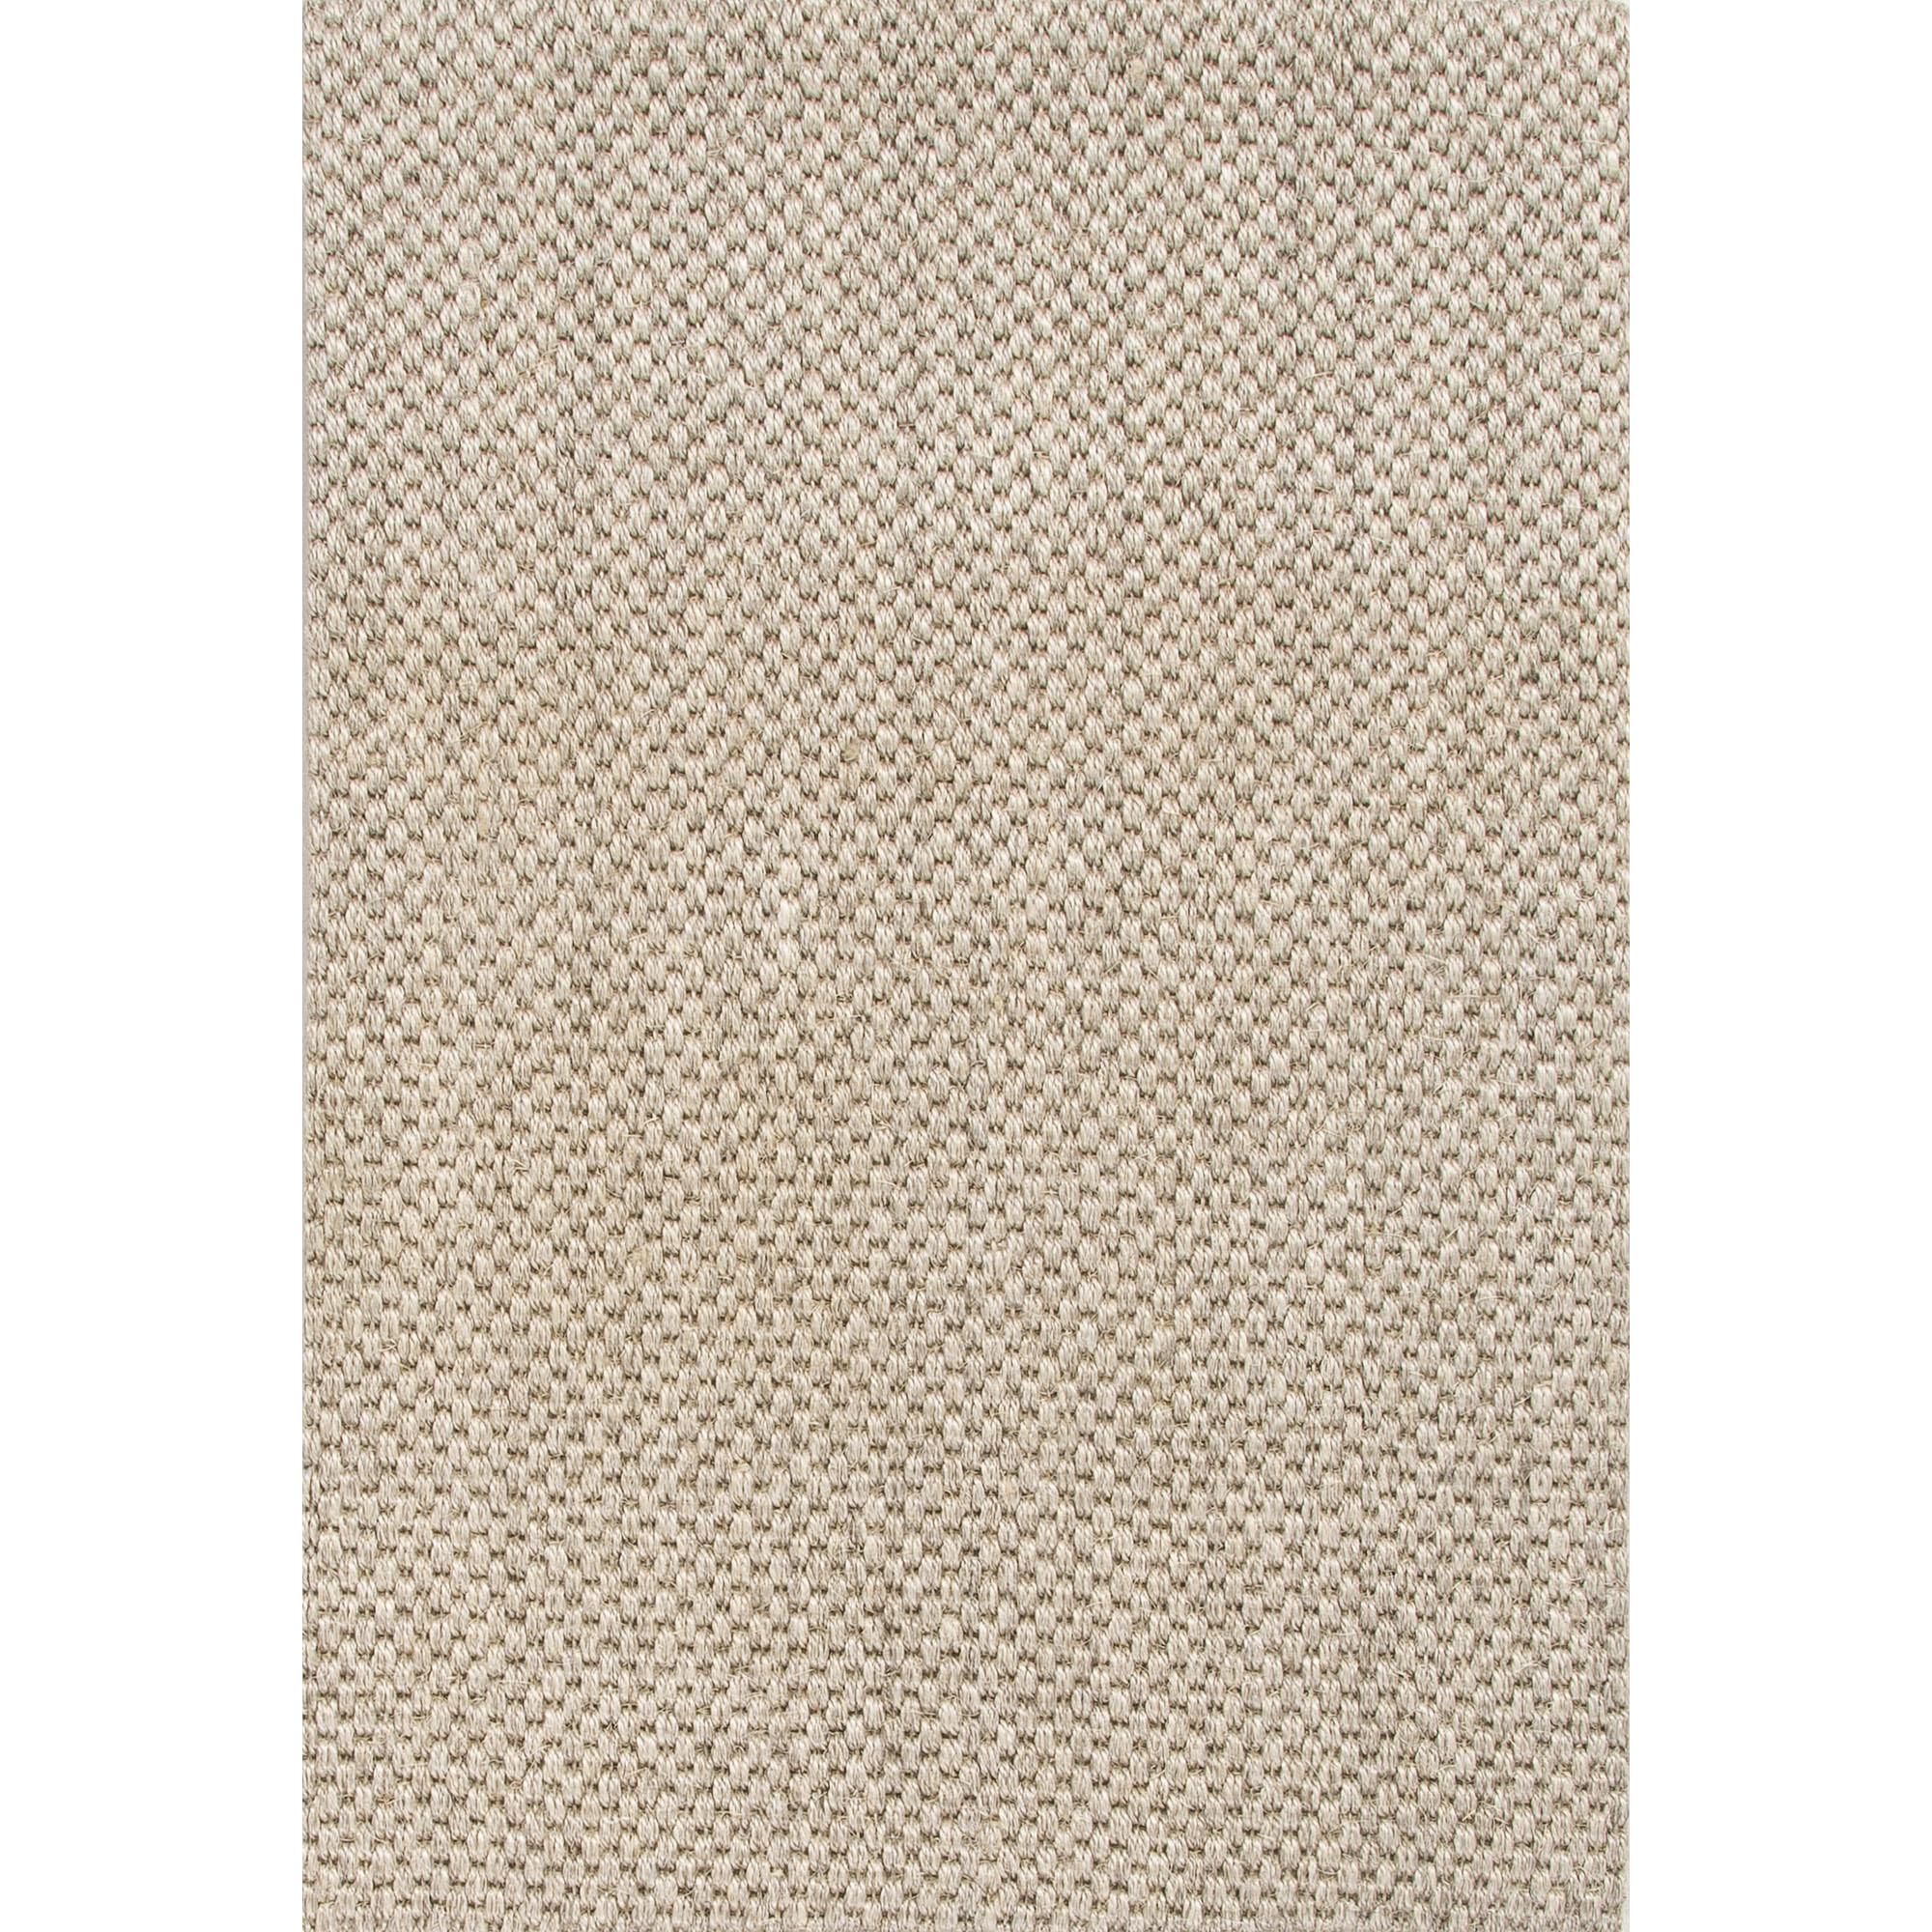 JAIPUR Rugs Naturals Sanibel 9 x 12 Rug - Item Number: RUG119176